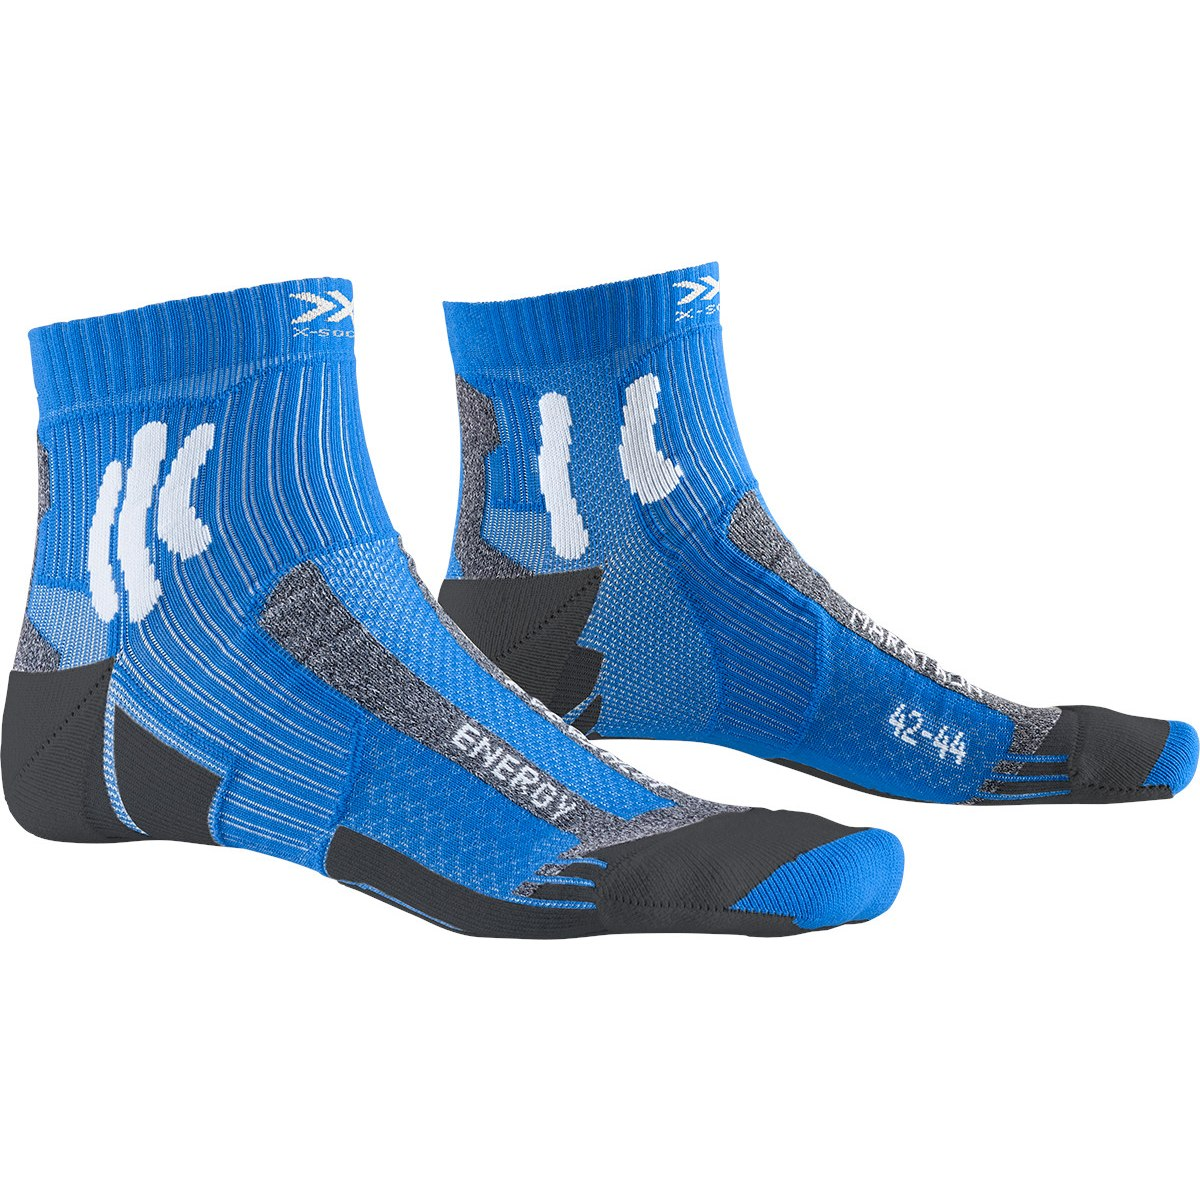 X-Socks Marathon Energy Laufsocken - twyce blue/anthracite